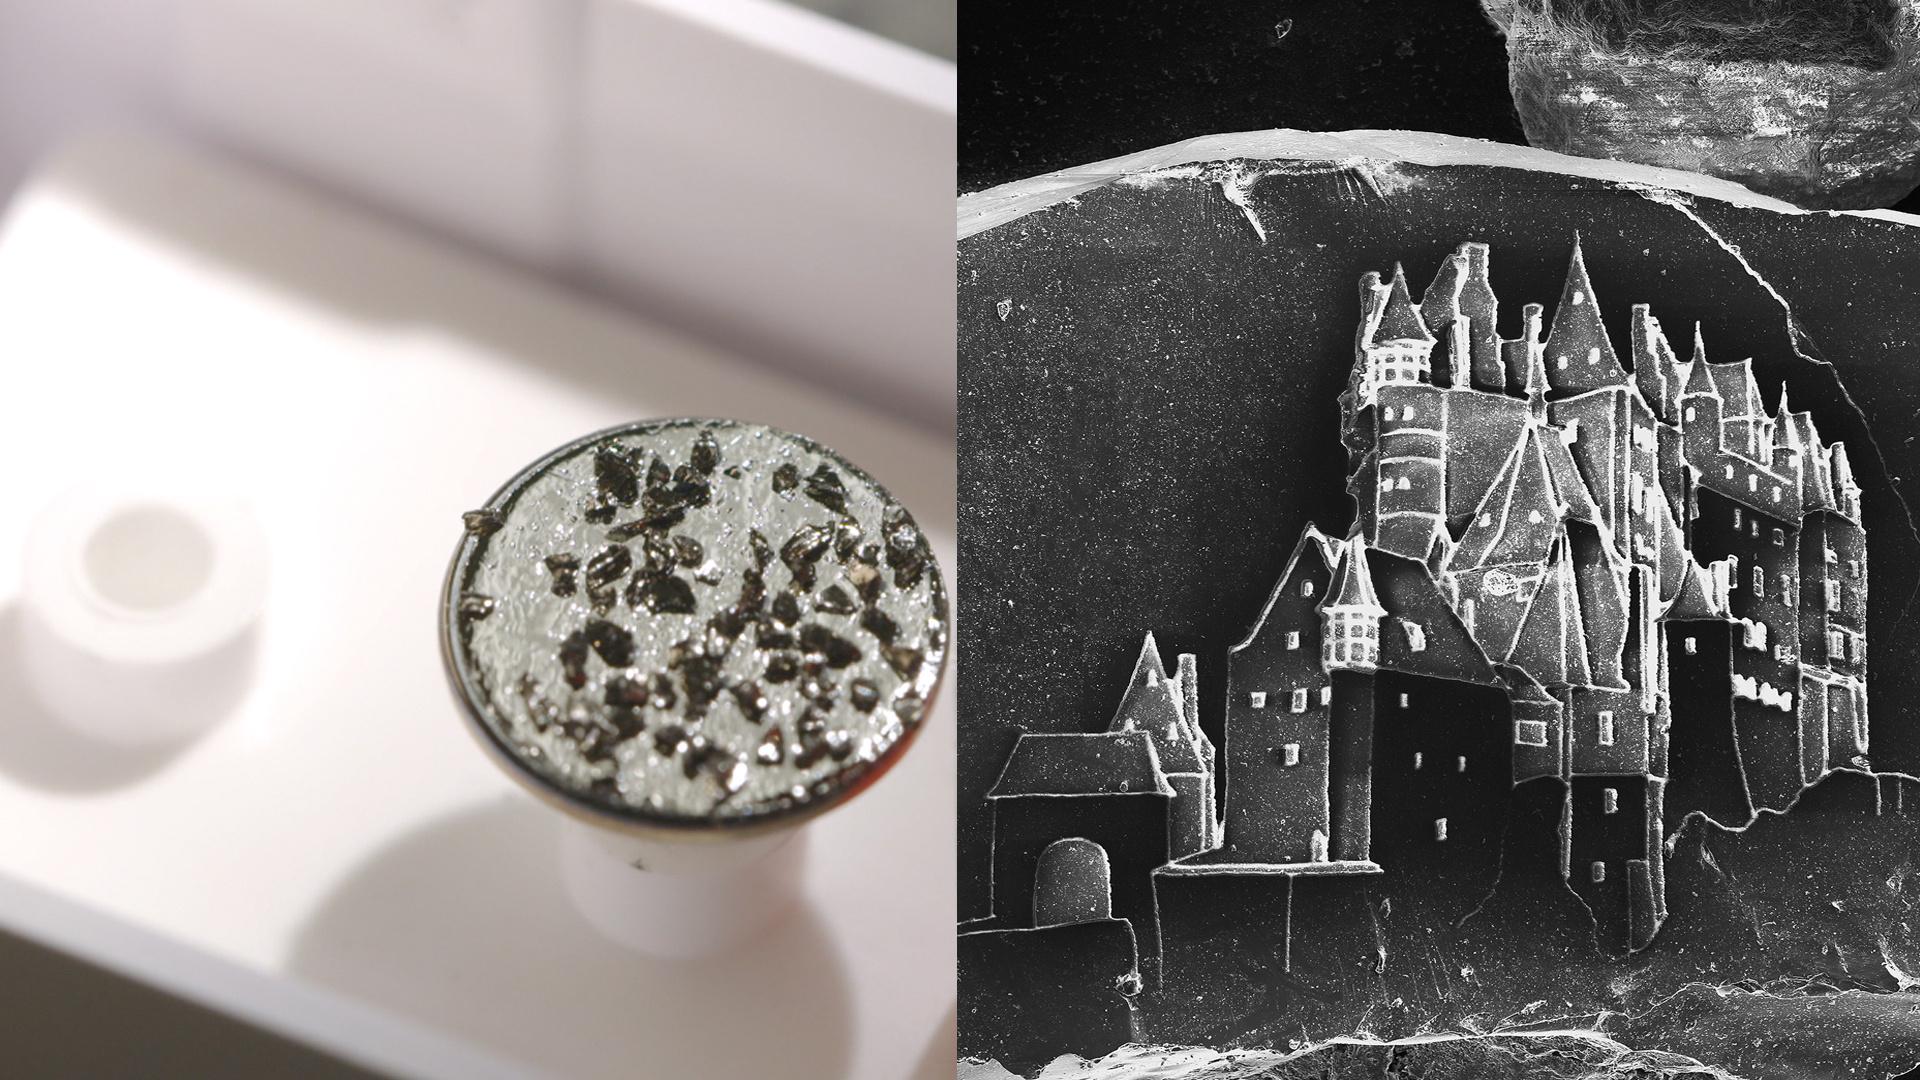 castillos-de-arena-microscópicos-vik-muniz-marcelo-coelho-5